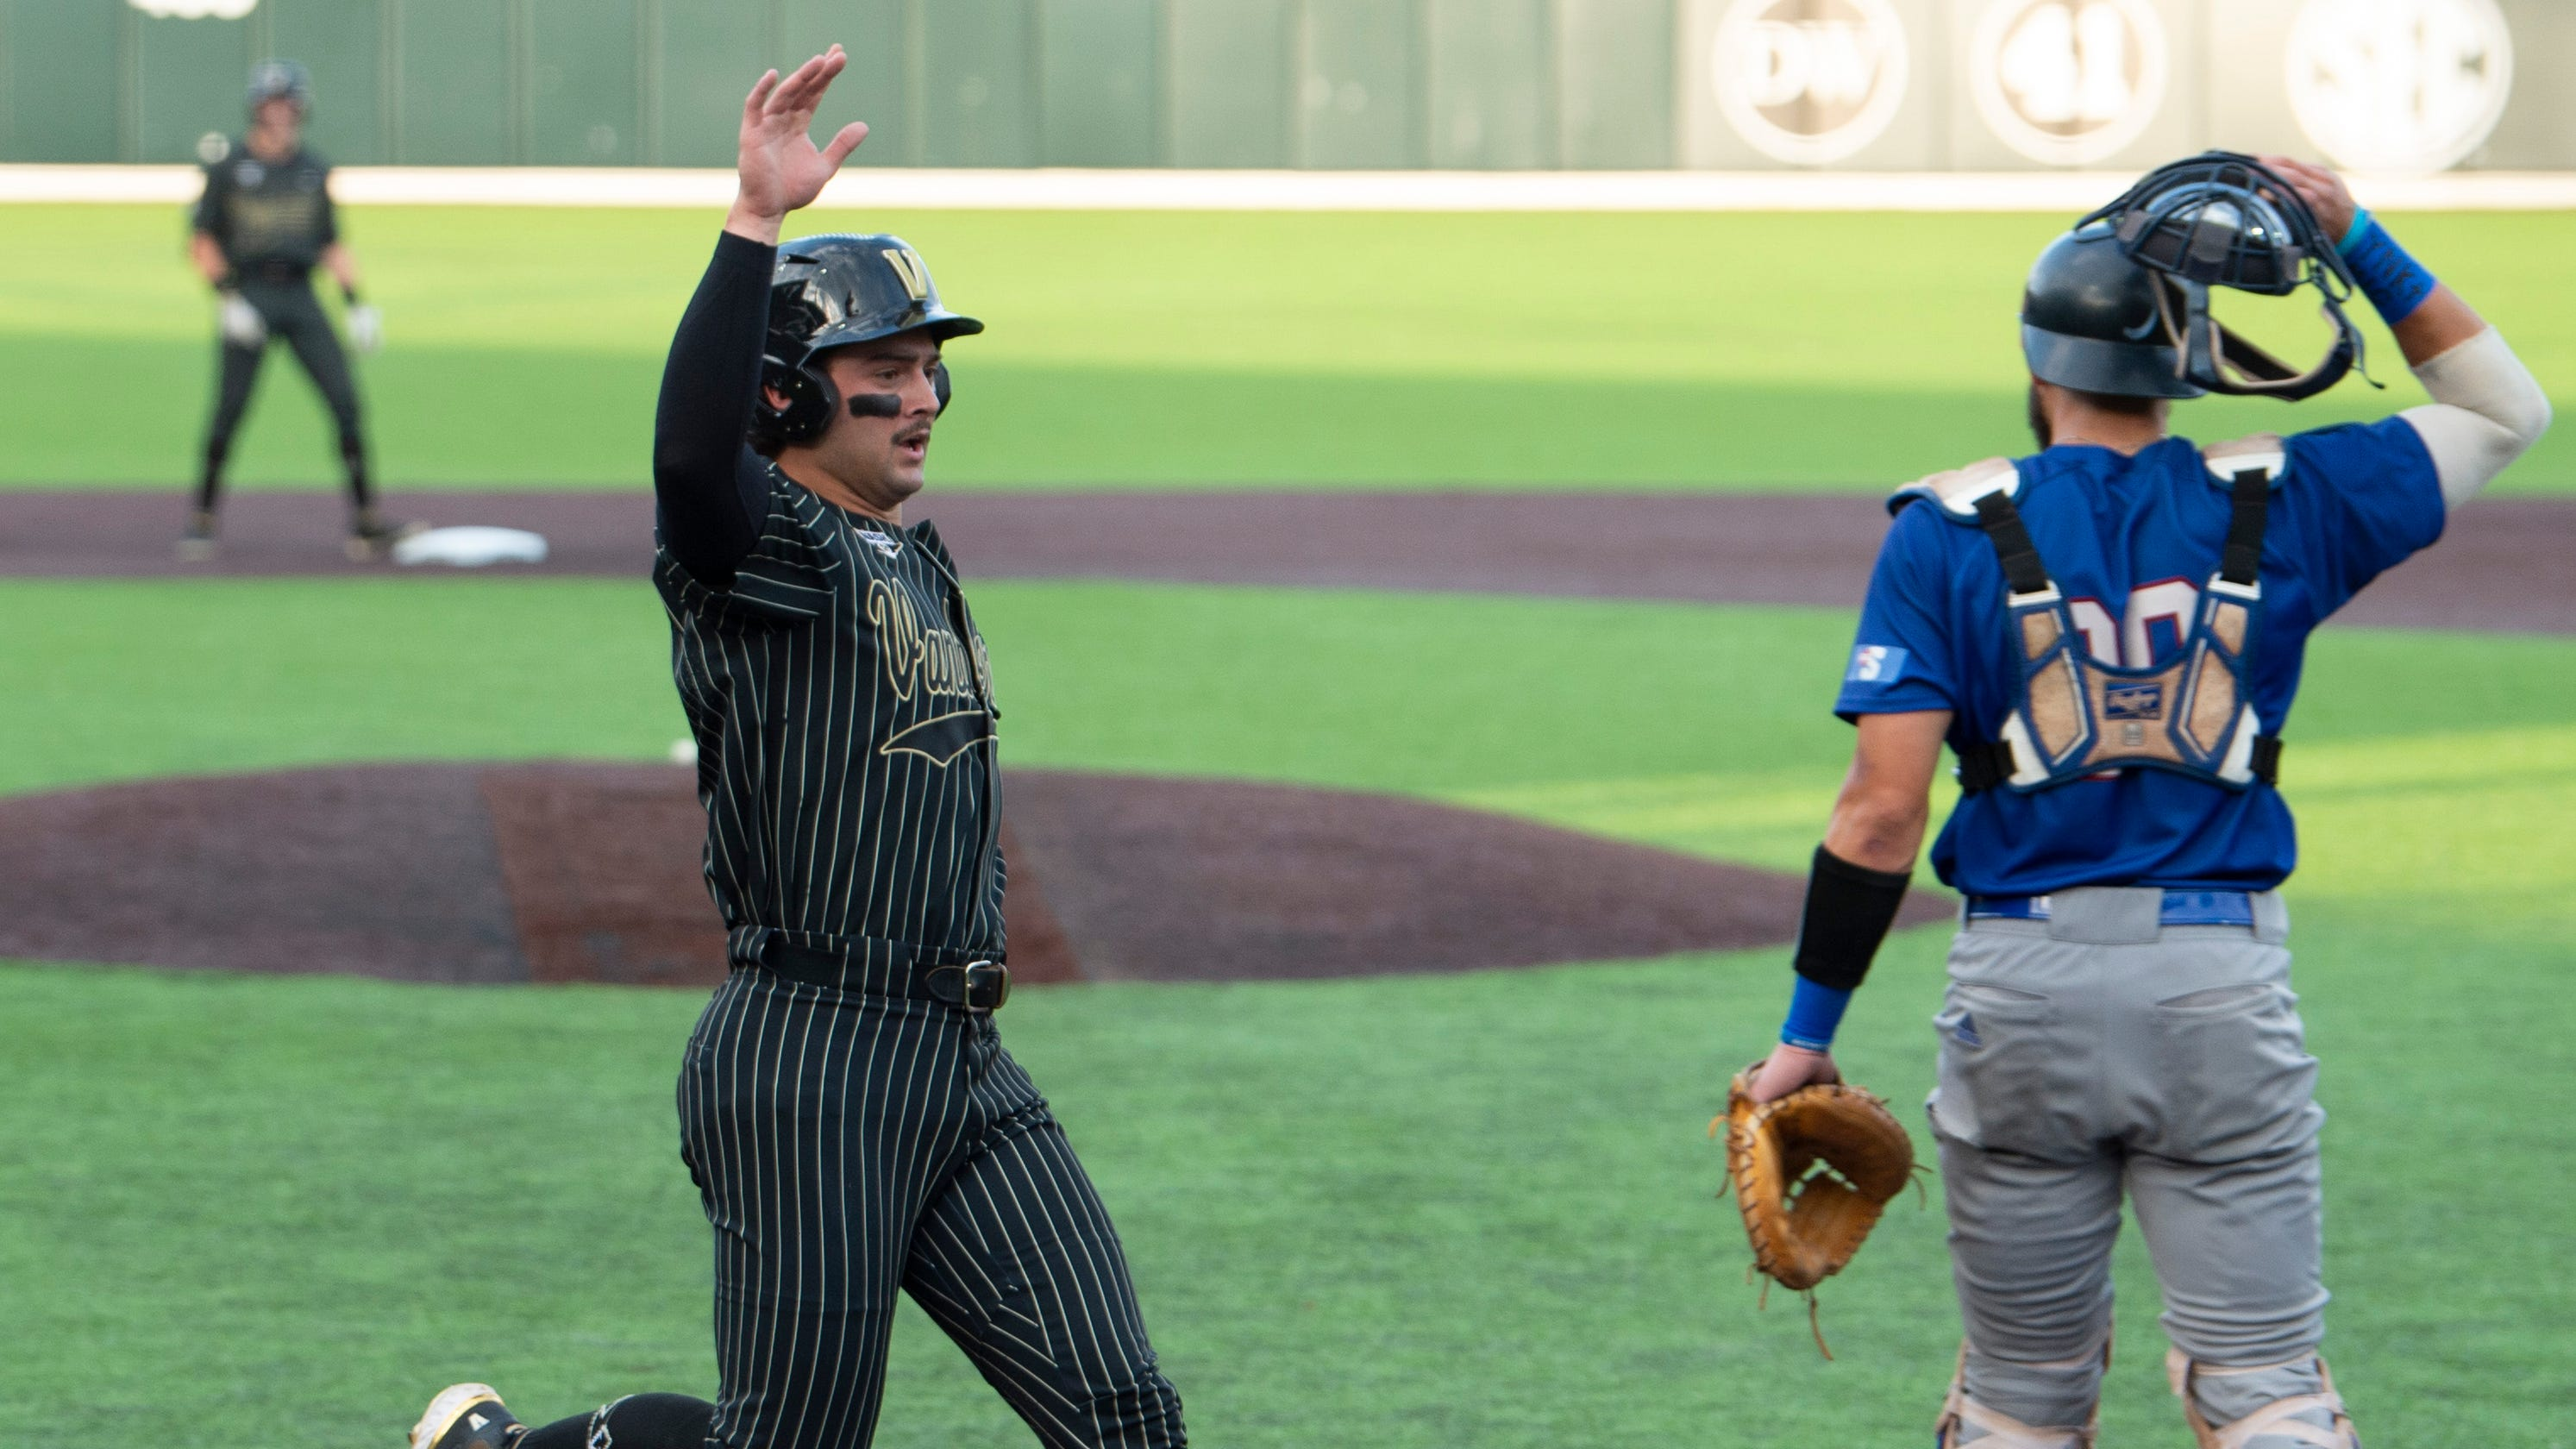 Vanderbilt infielder Tate Kolwyck leaves with injury vs. Presbyterian Blue Hose baseball